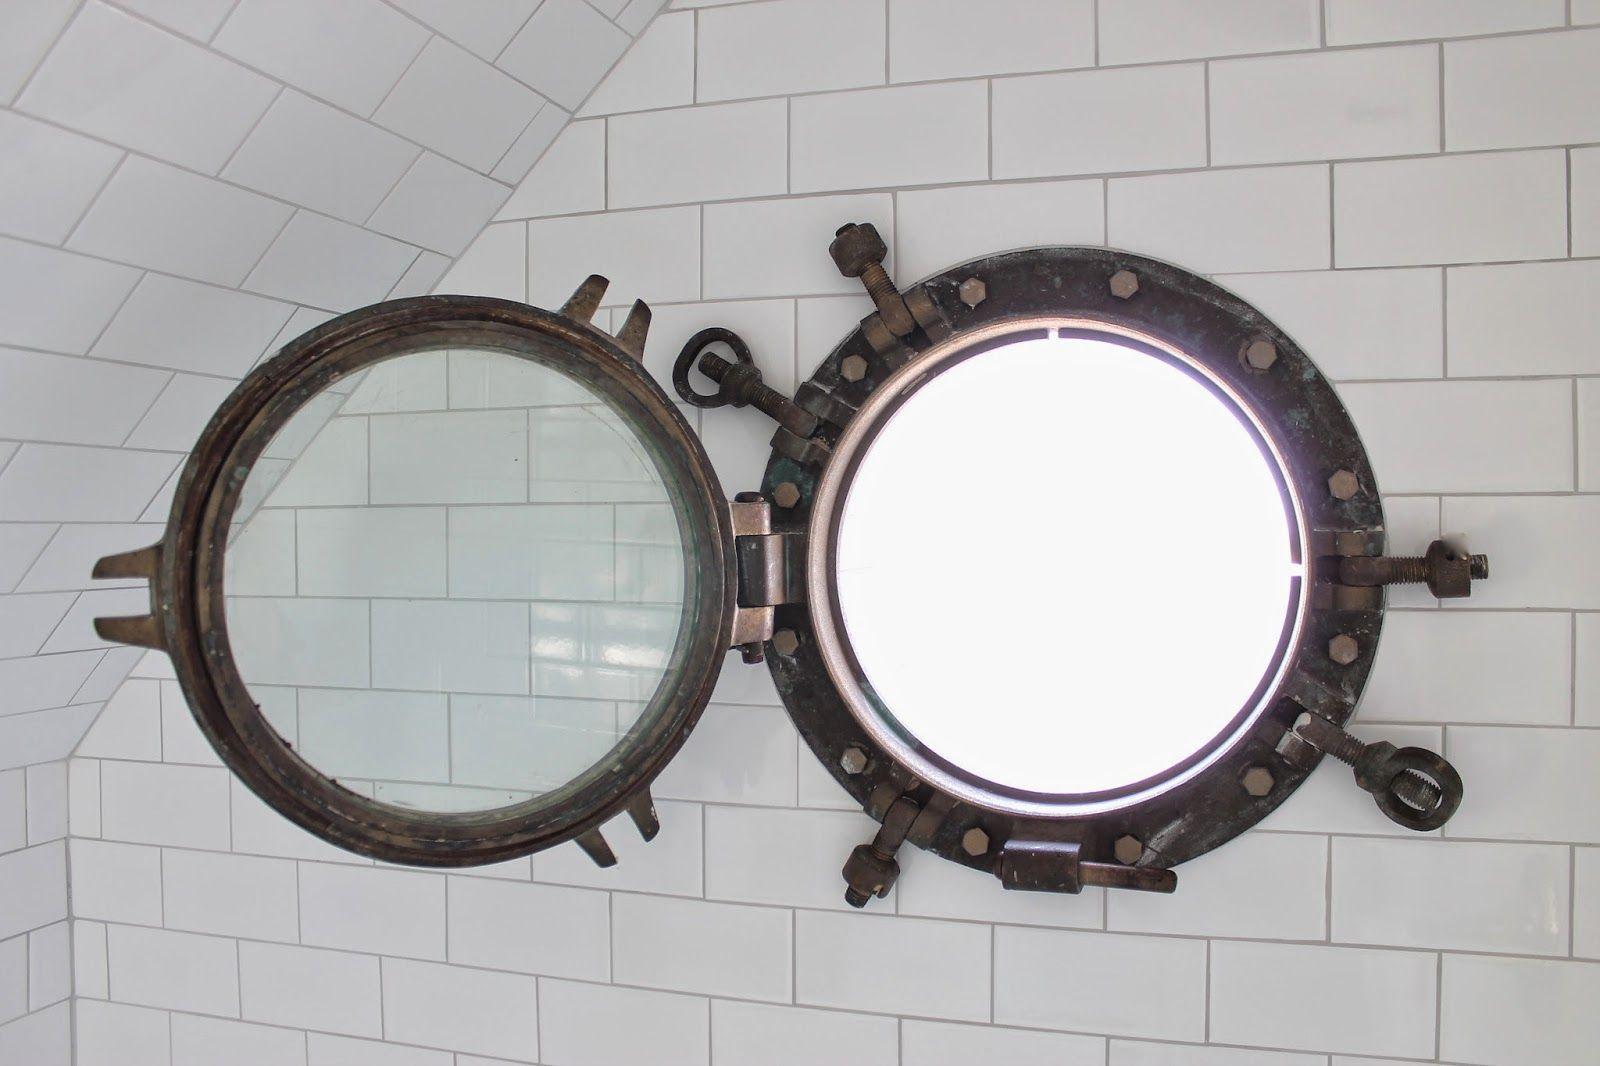 porthole window | Dream House | Pinterest | Window, Earthship design ...